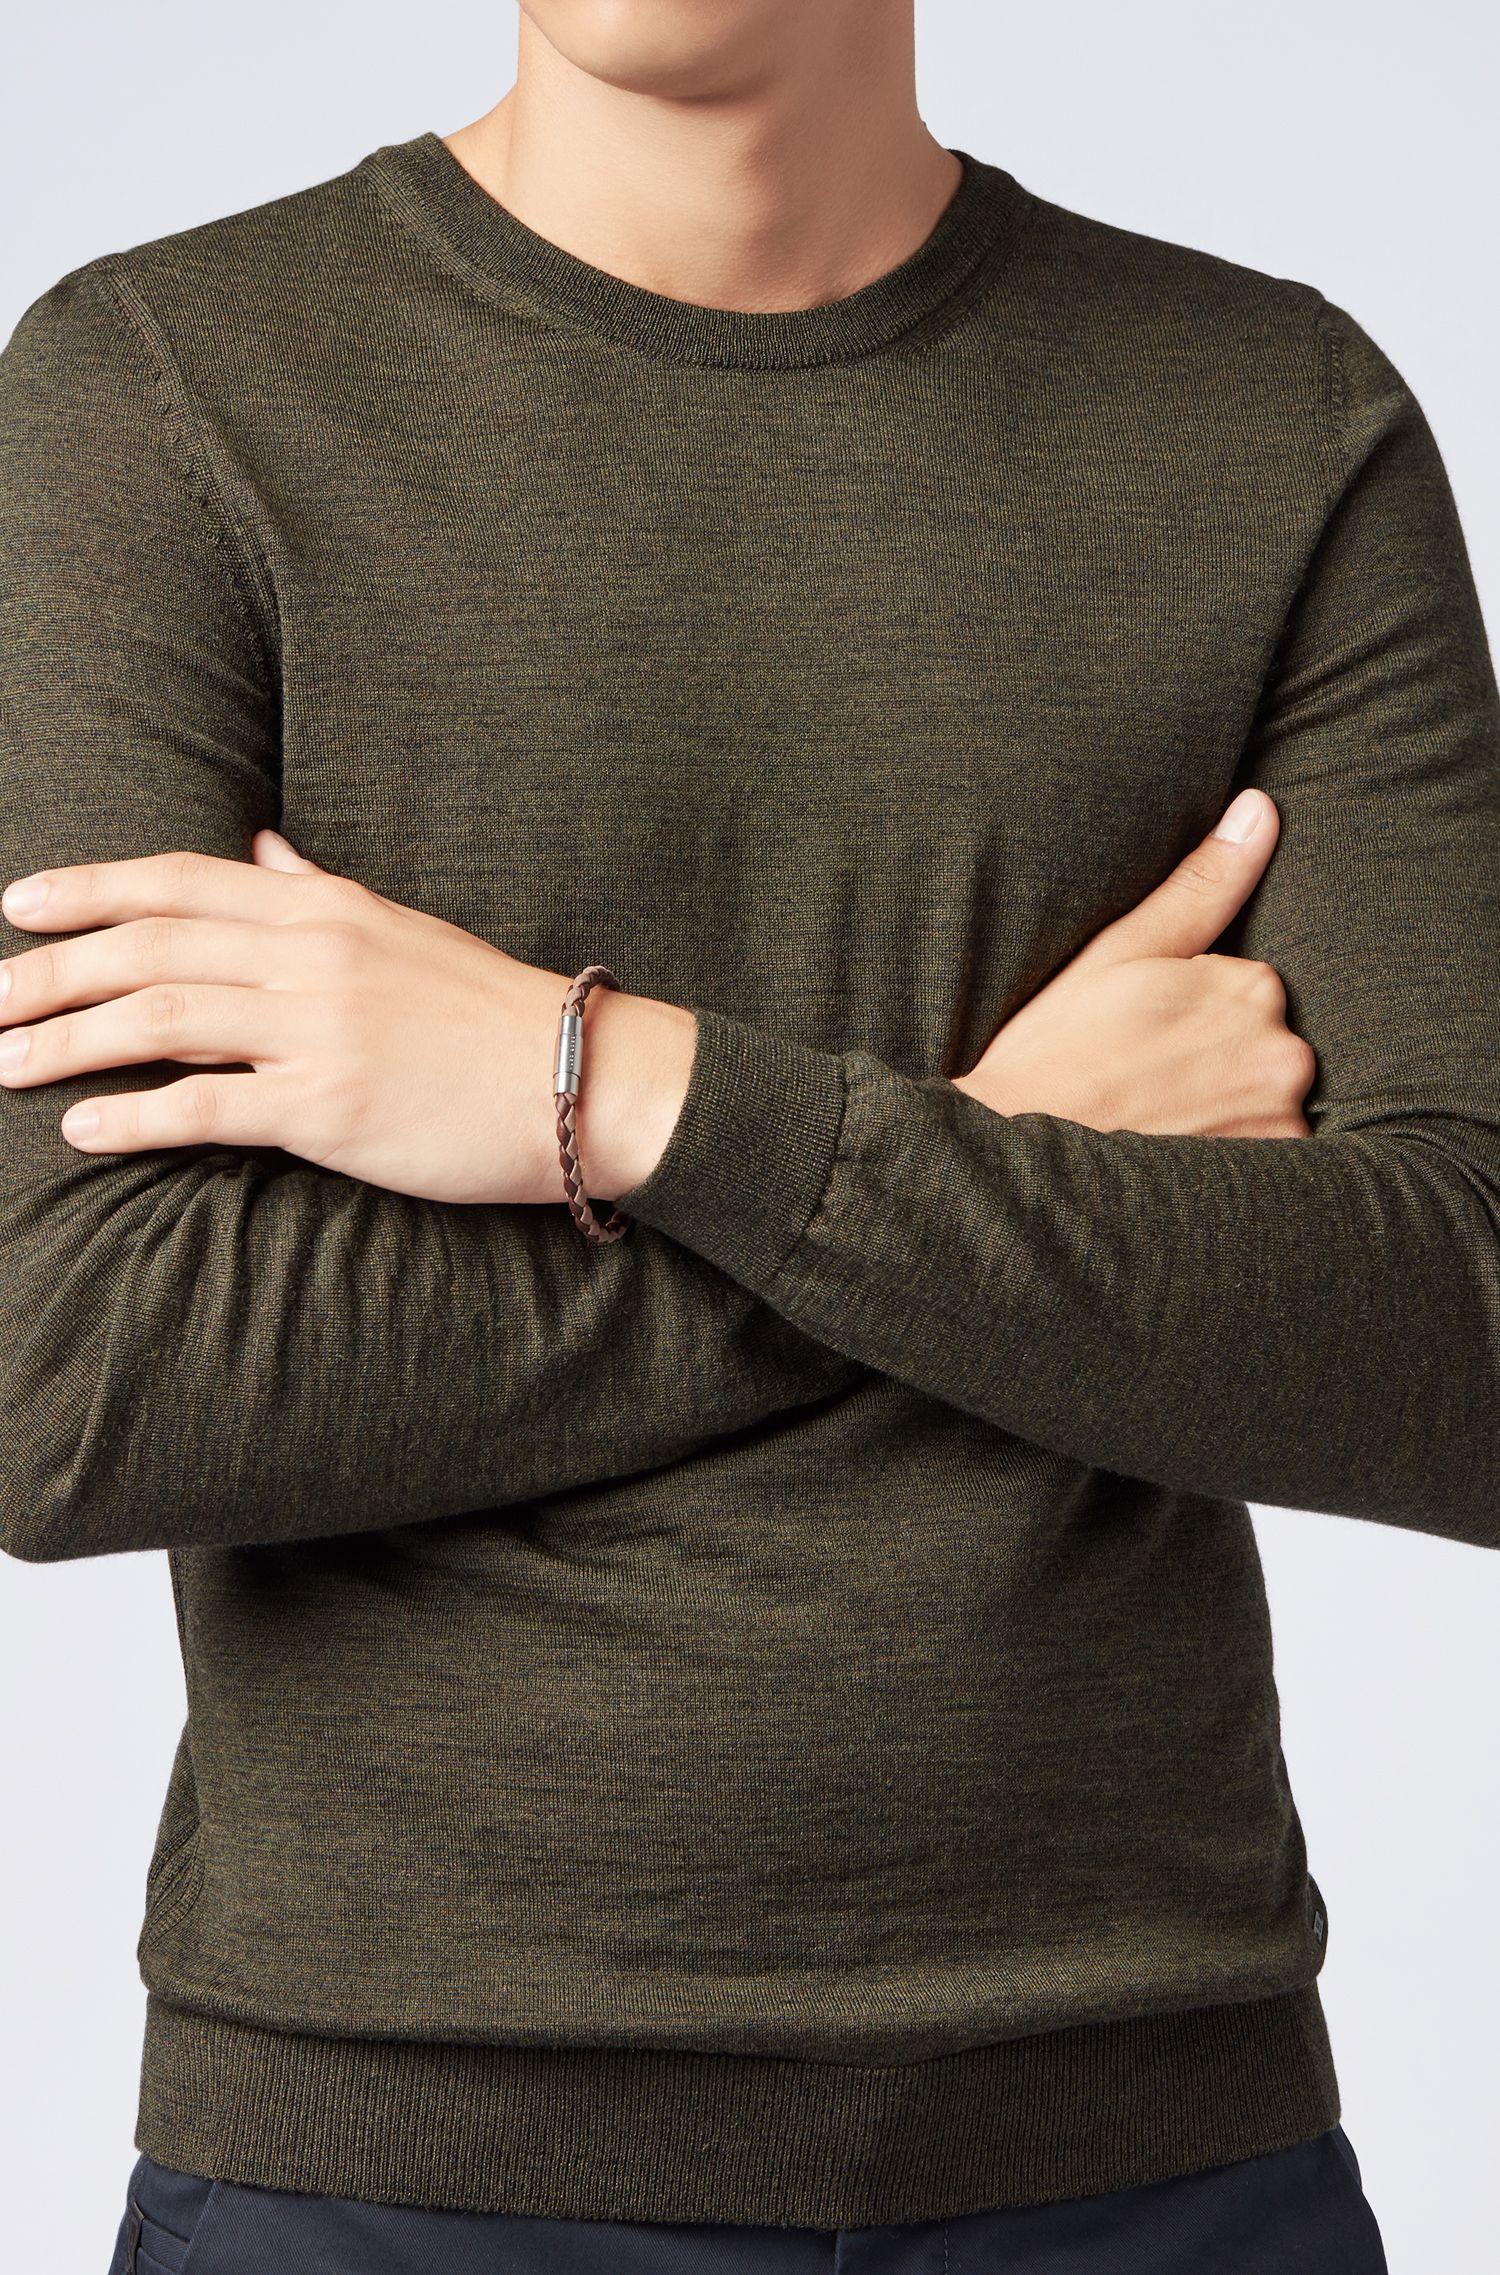 Italian-made single-wrap bracelet in woven calf leather